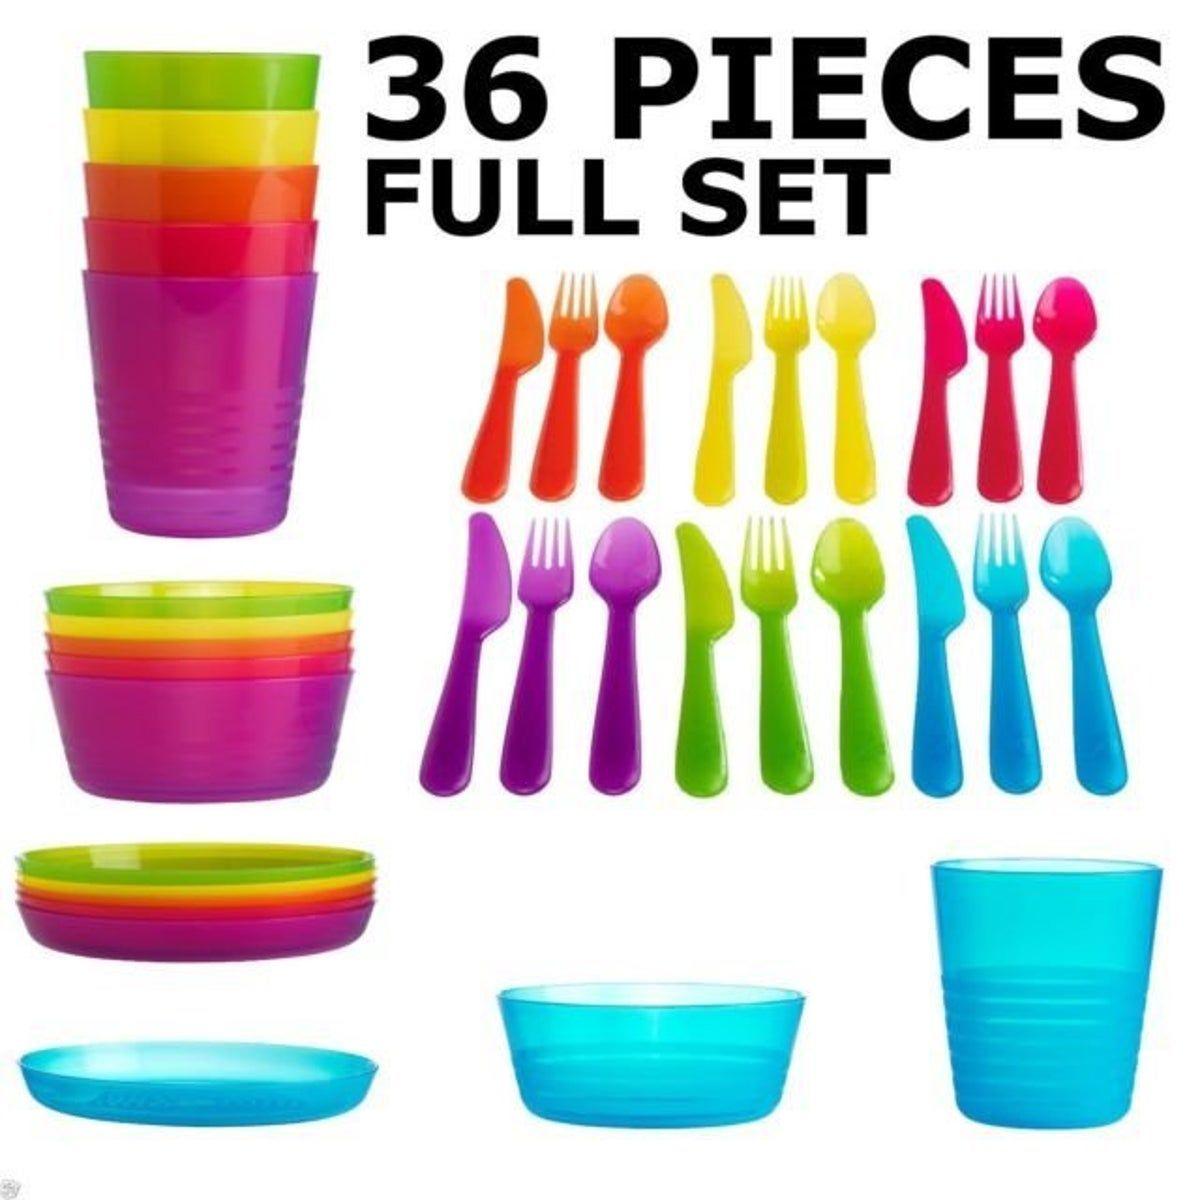 Ikea Kalas Children S Tableware Bpa Free Ikea Kalas Children S Tableware Bpa Free Bpa Childrens Free Ikea In 2020 Plates And Bowls Plastic Dinner Set Cutlery Set